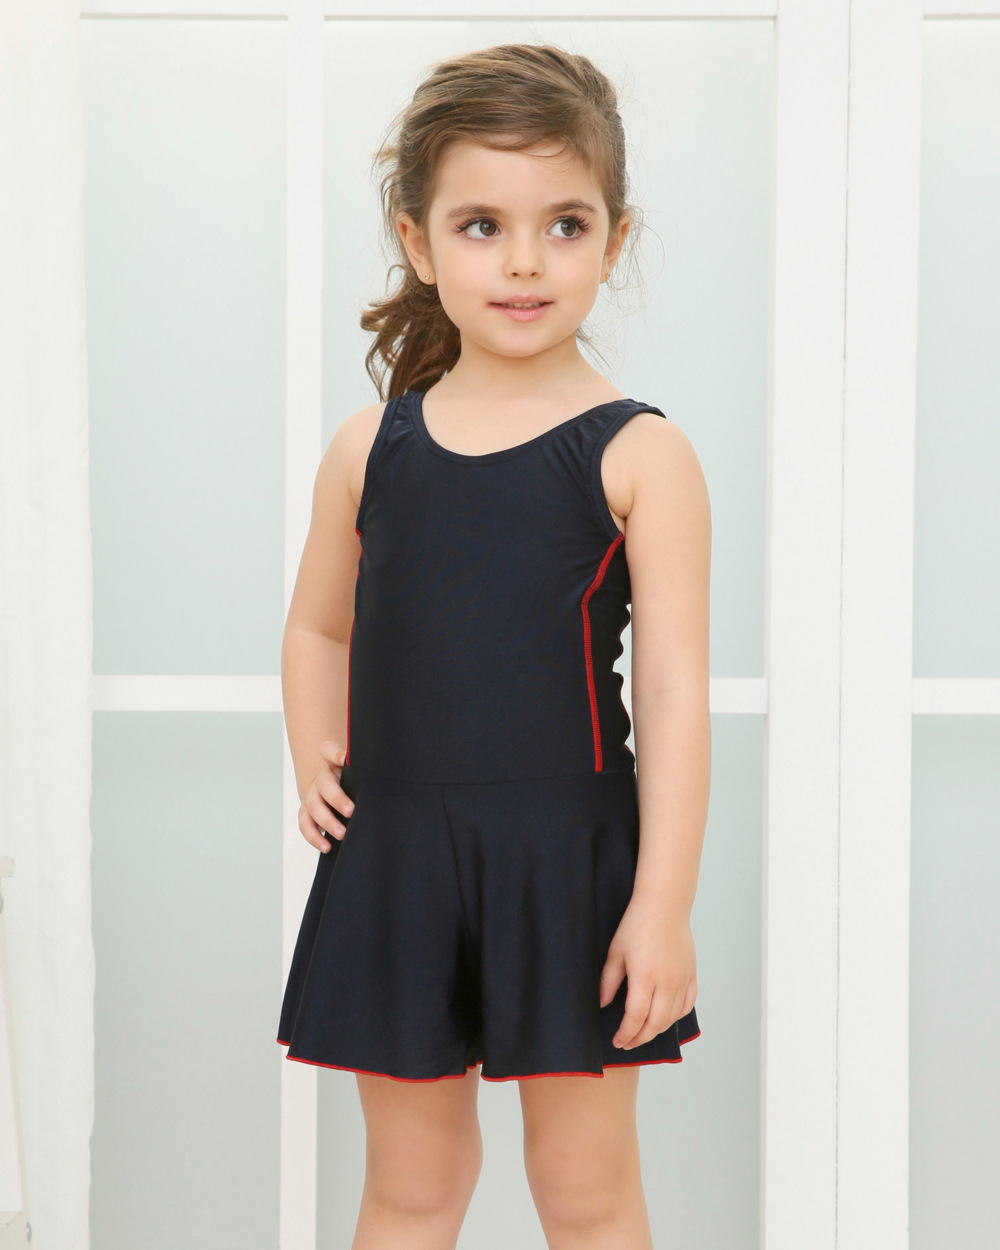 New Style Dress-Japanese-style Students Swimwear CHILDREN'S Swimwear Korean-style Cute Holiday Bubble Hot Spring 2019 New Style